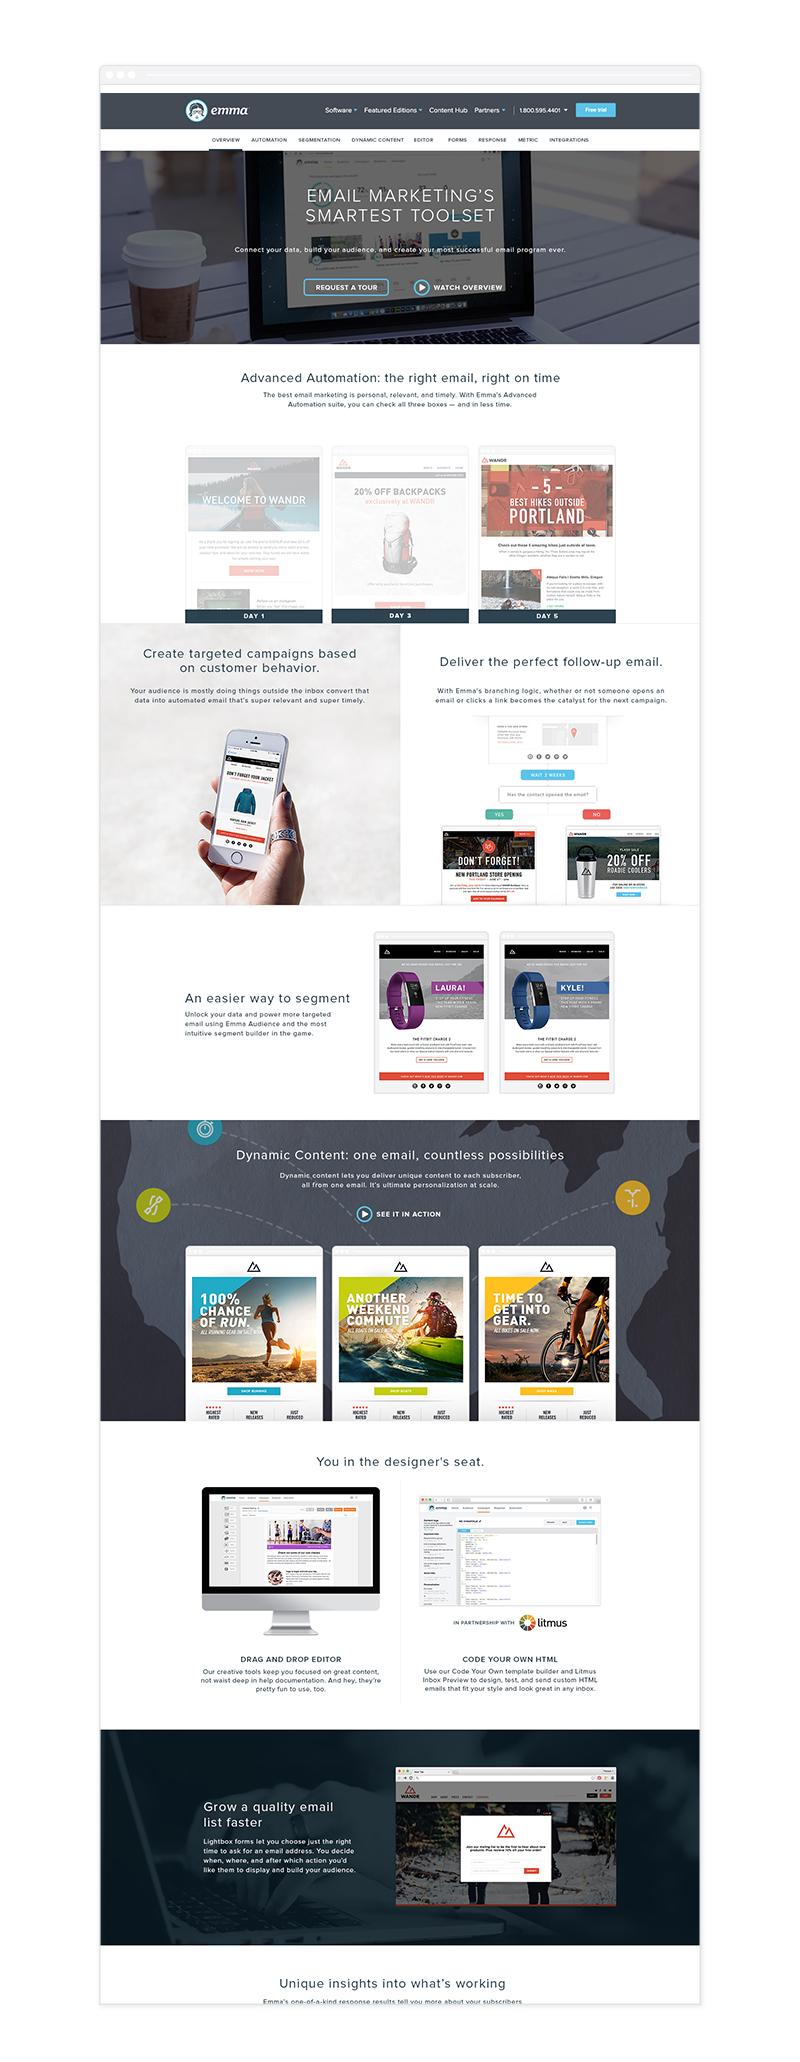 GF_Site_Long_Features